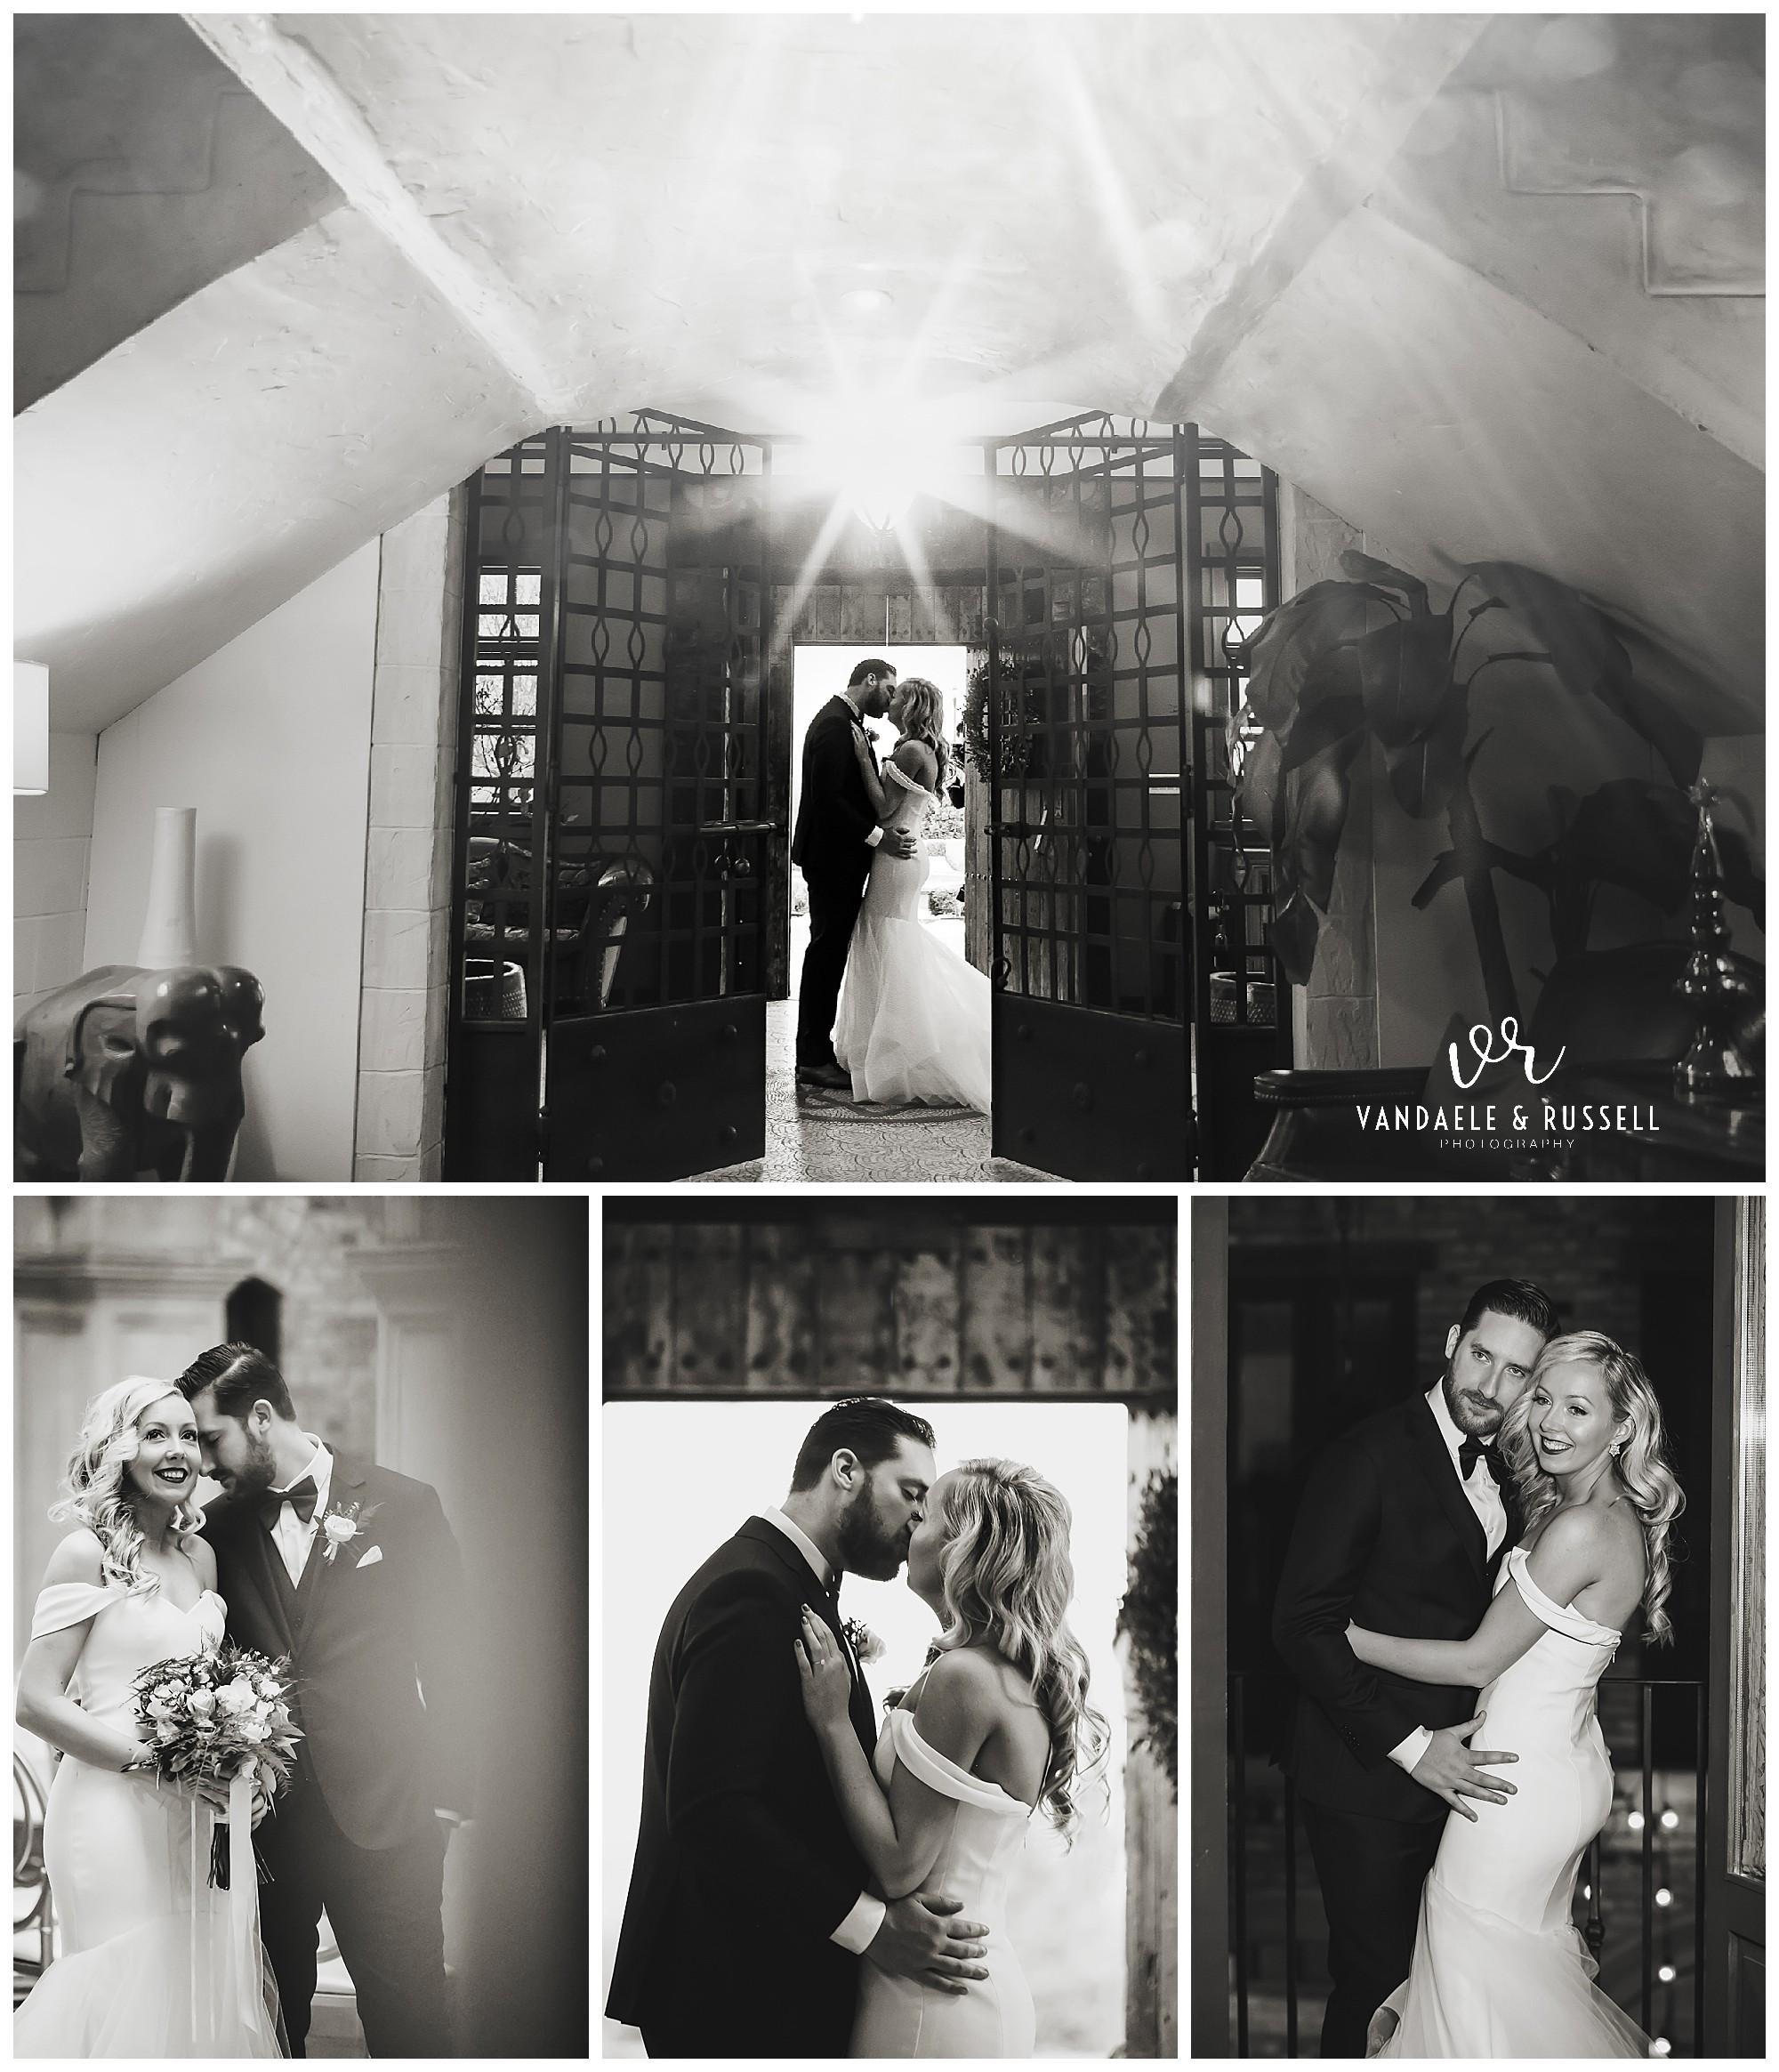 Hacienda-Sarria-Wedding-Photos-NYE-Michelle-Matt-VanDaele-Russell_0019.jpg